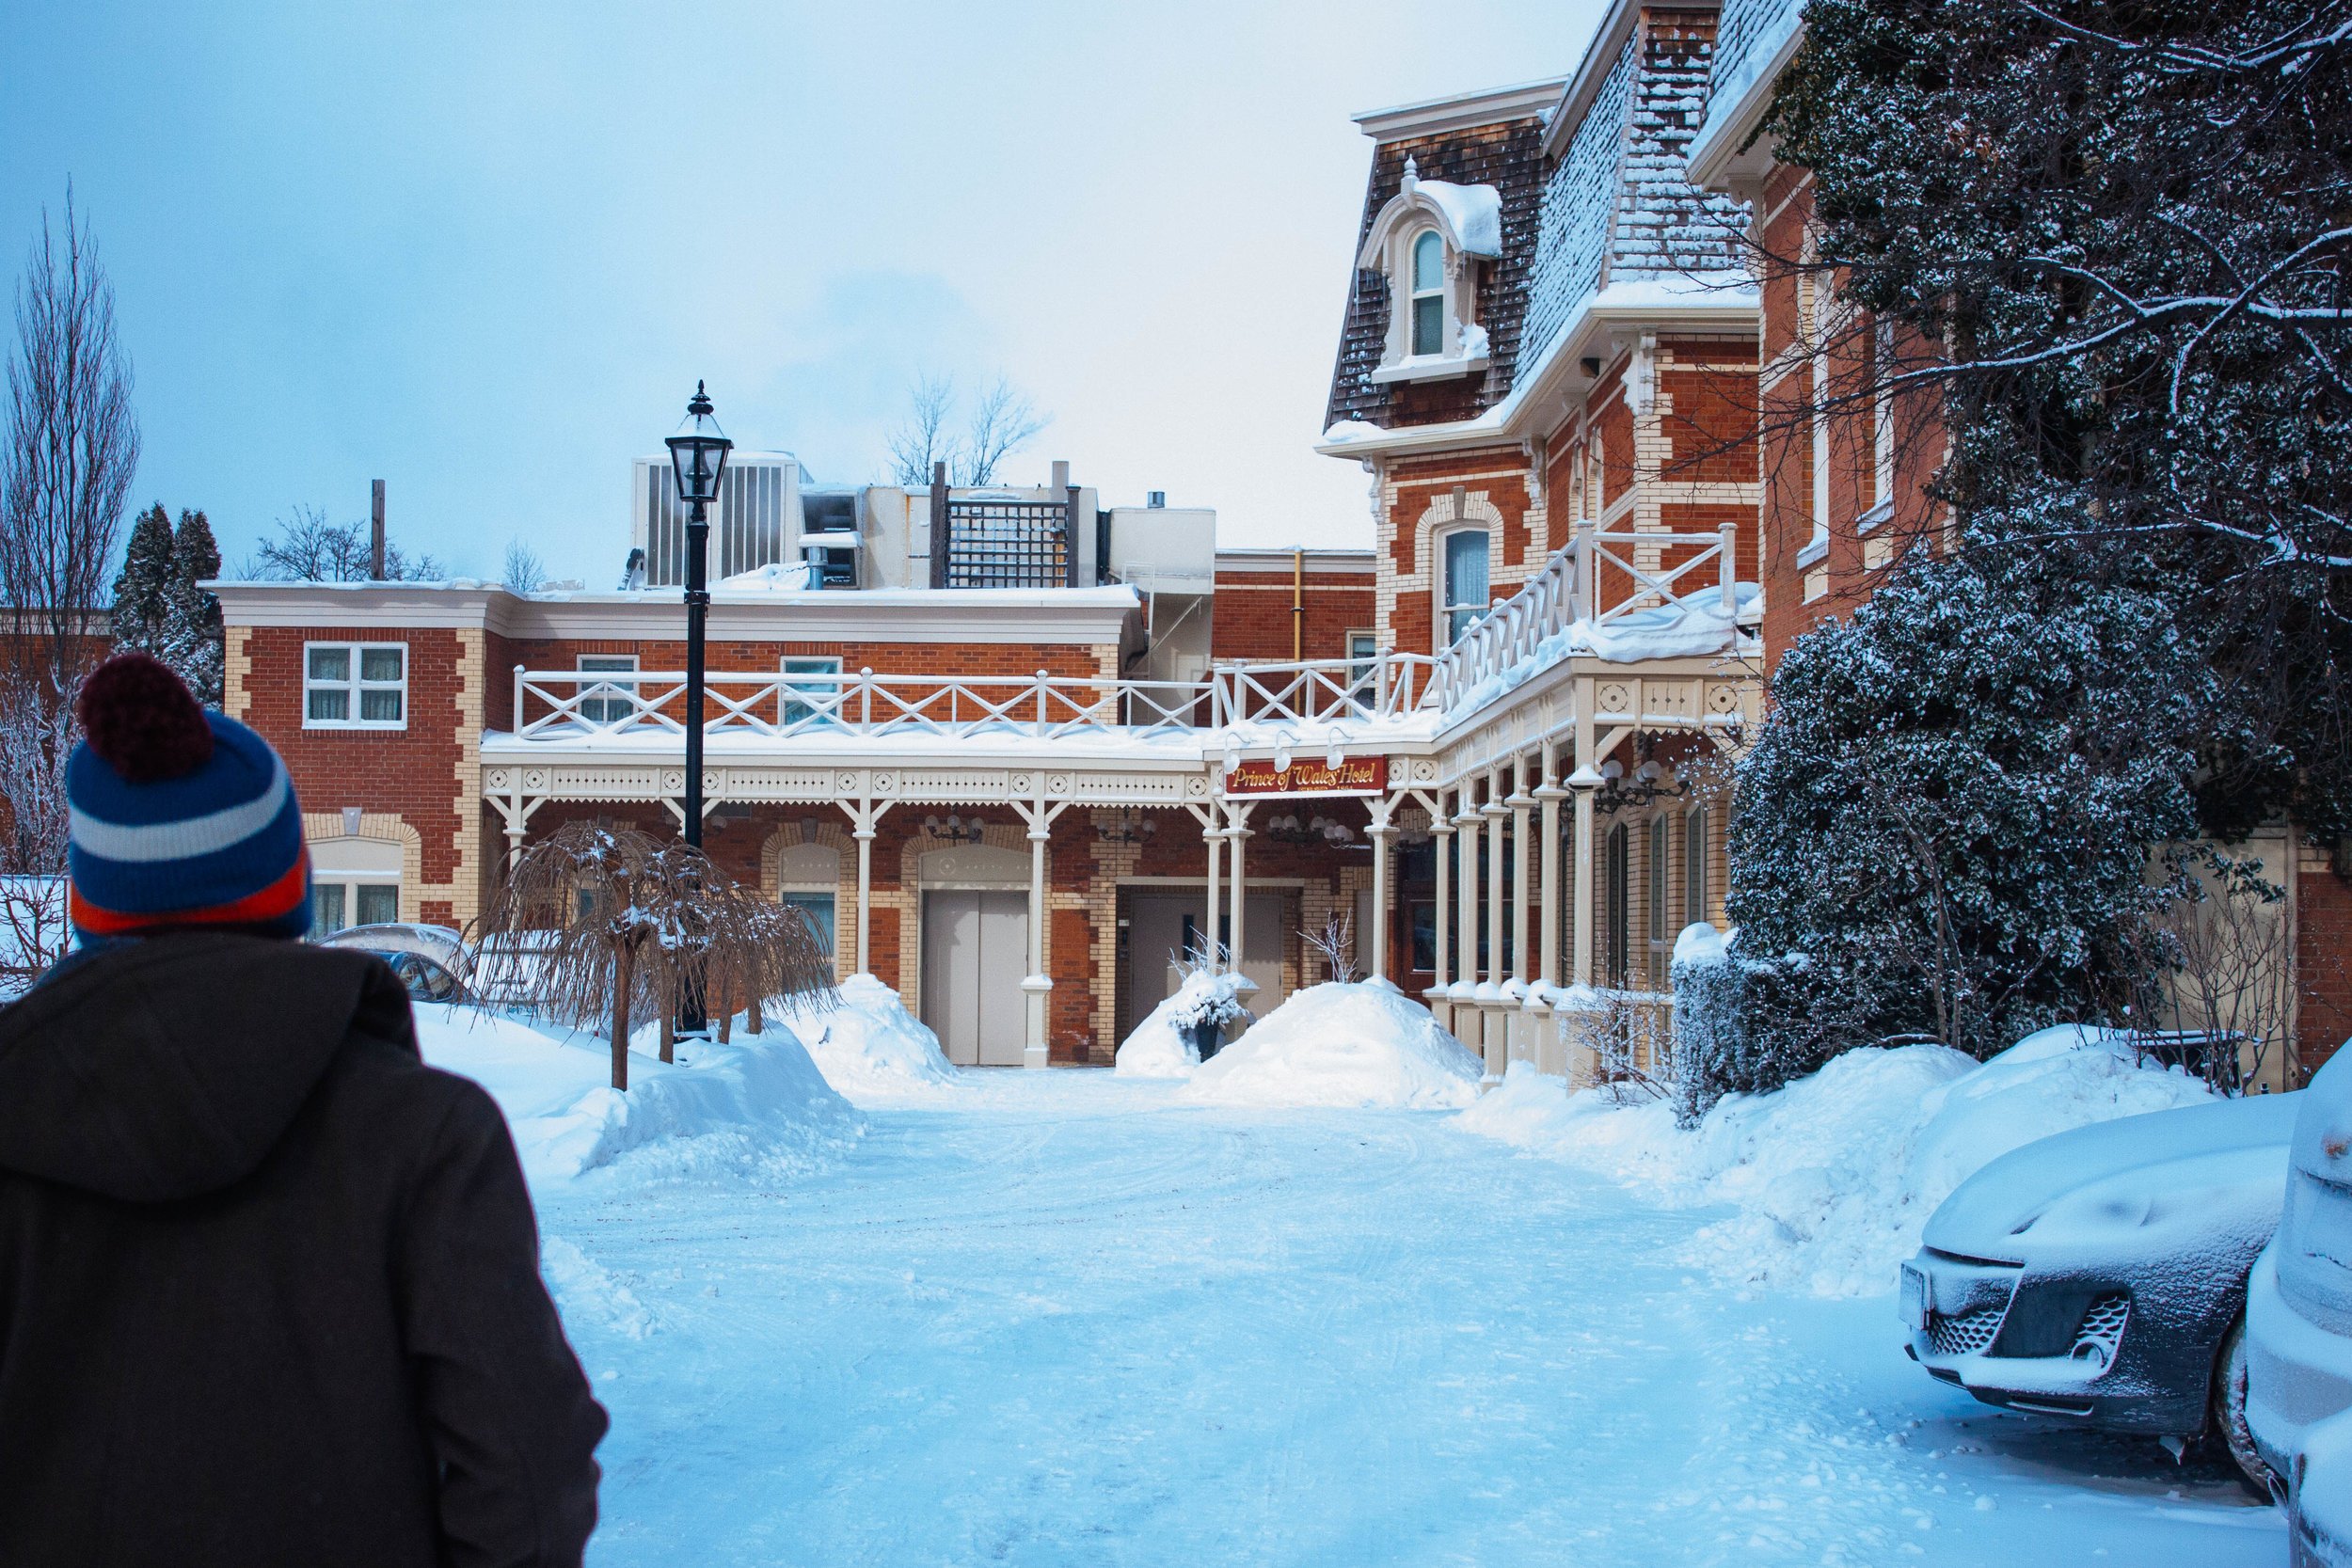 Niagara on the Lake Prince of Wales Hotel